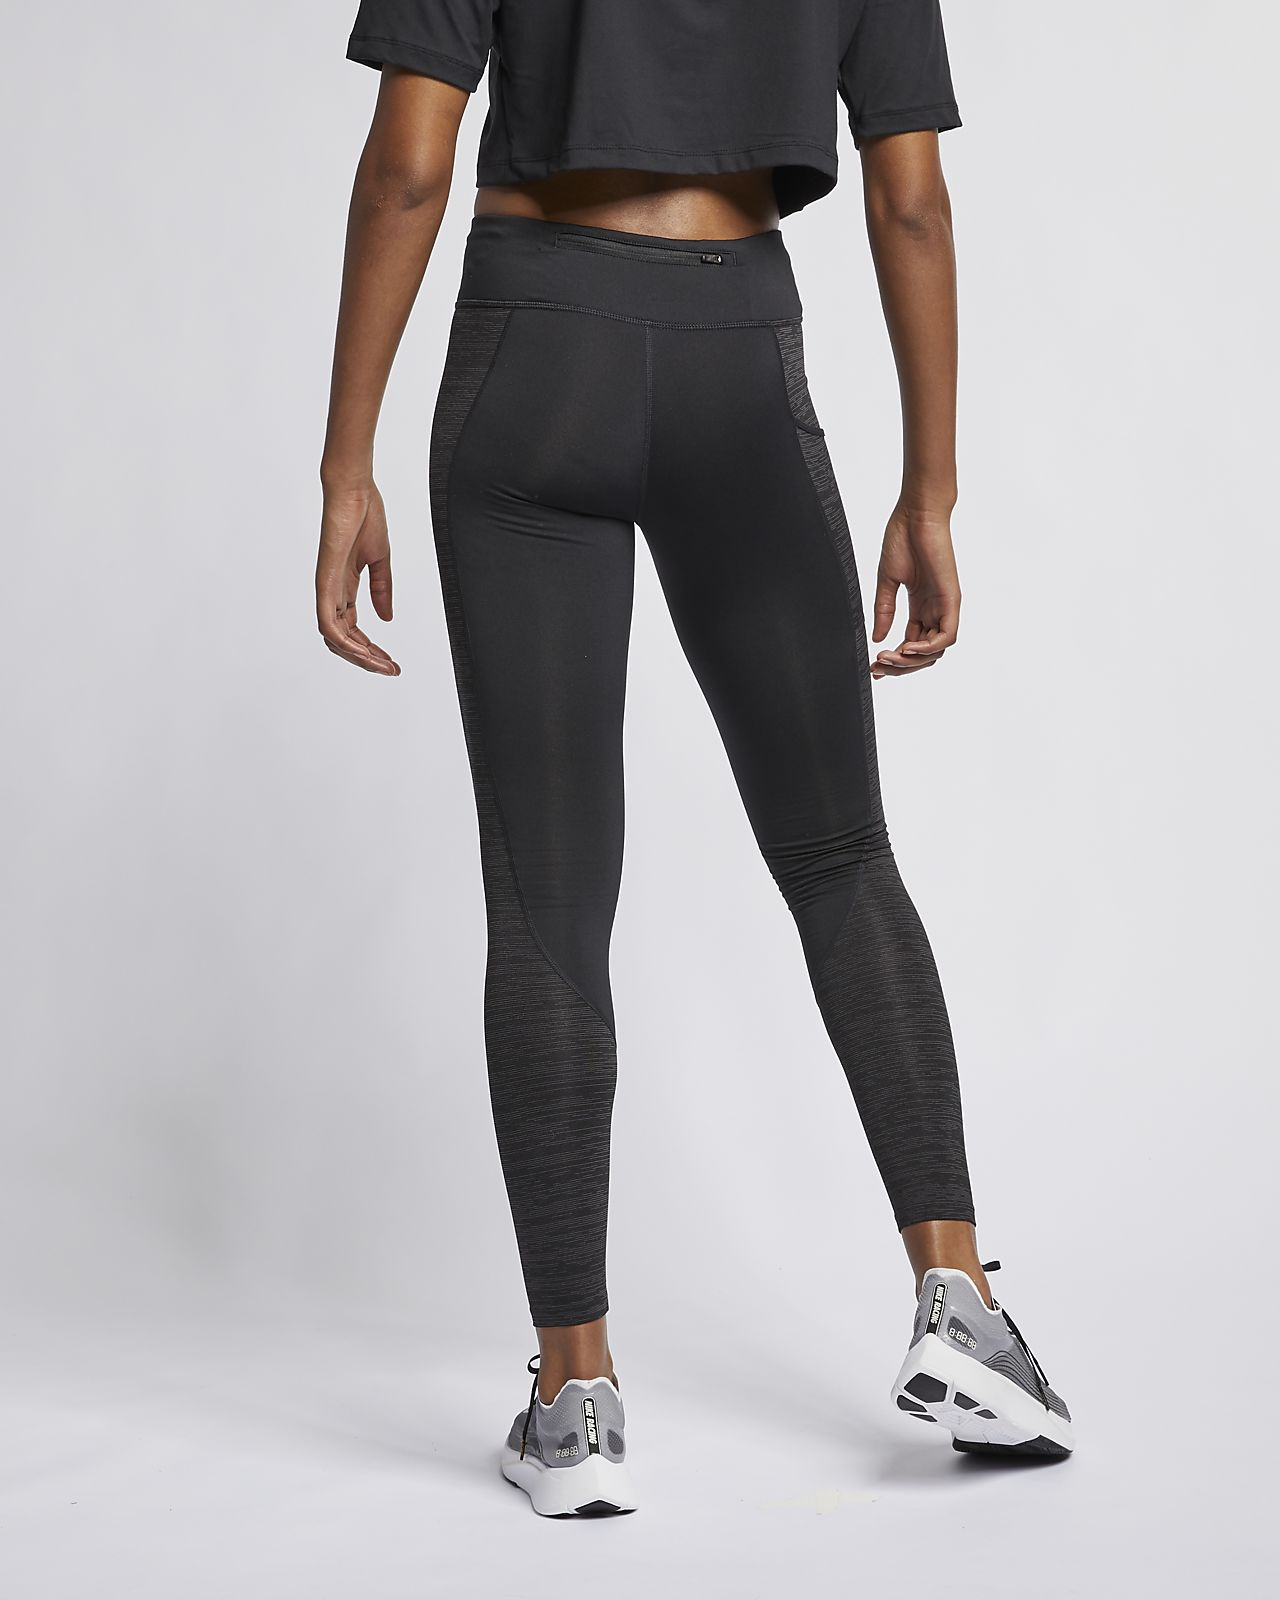 Tights de running de aquecimento Nike Racer para mulher